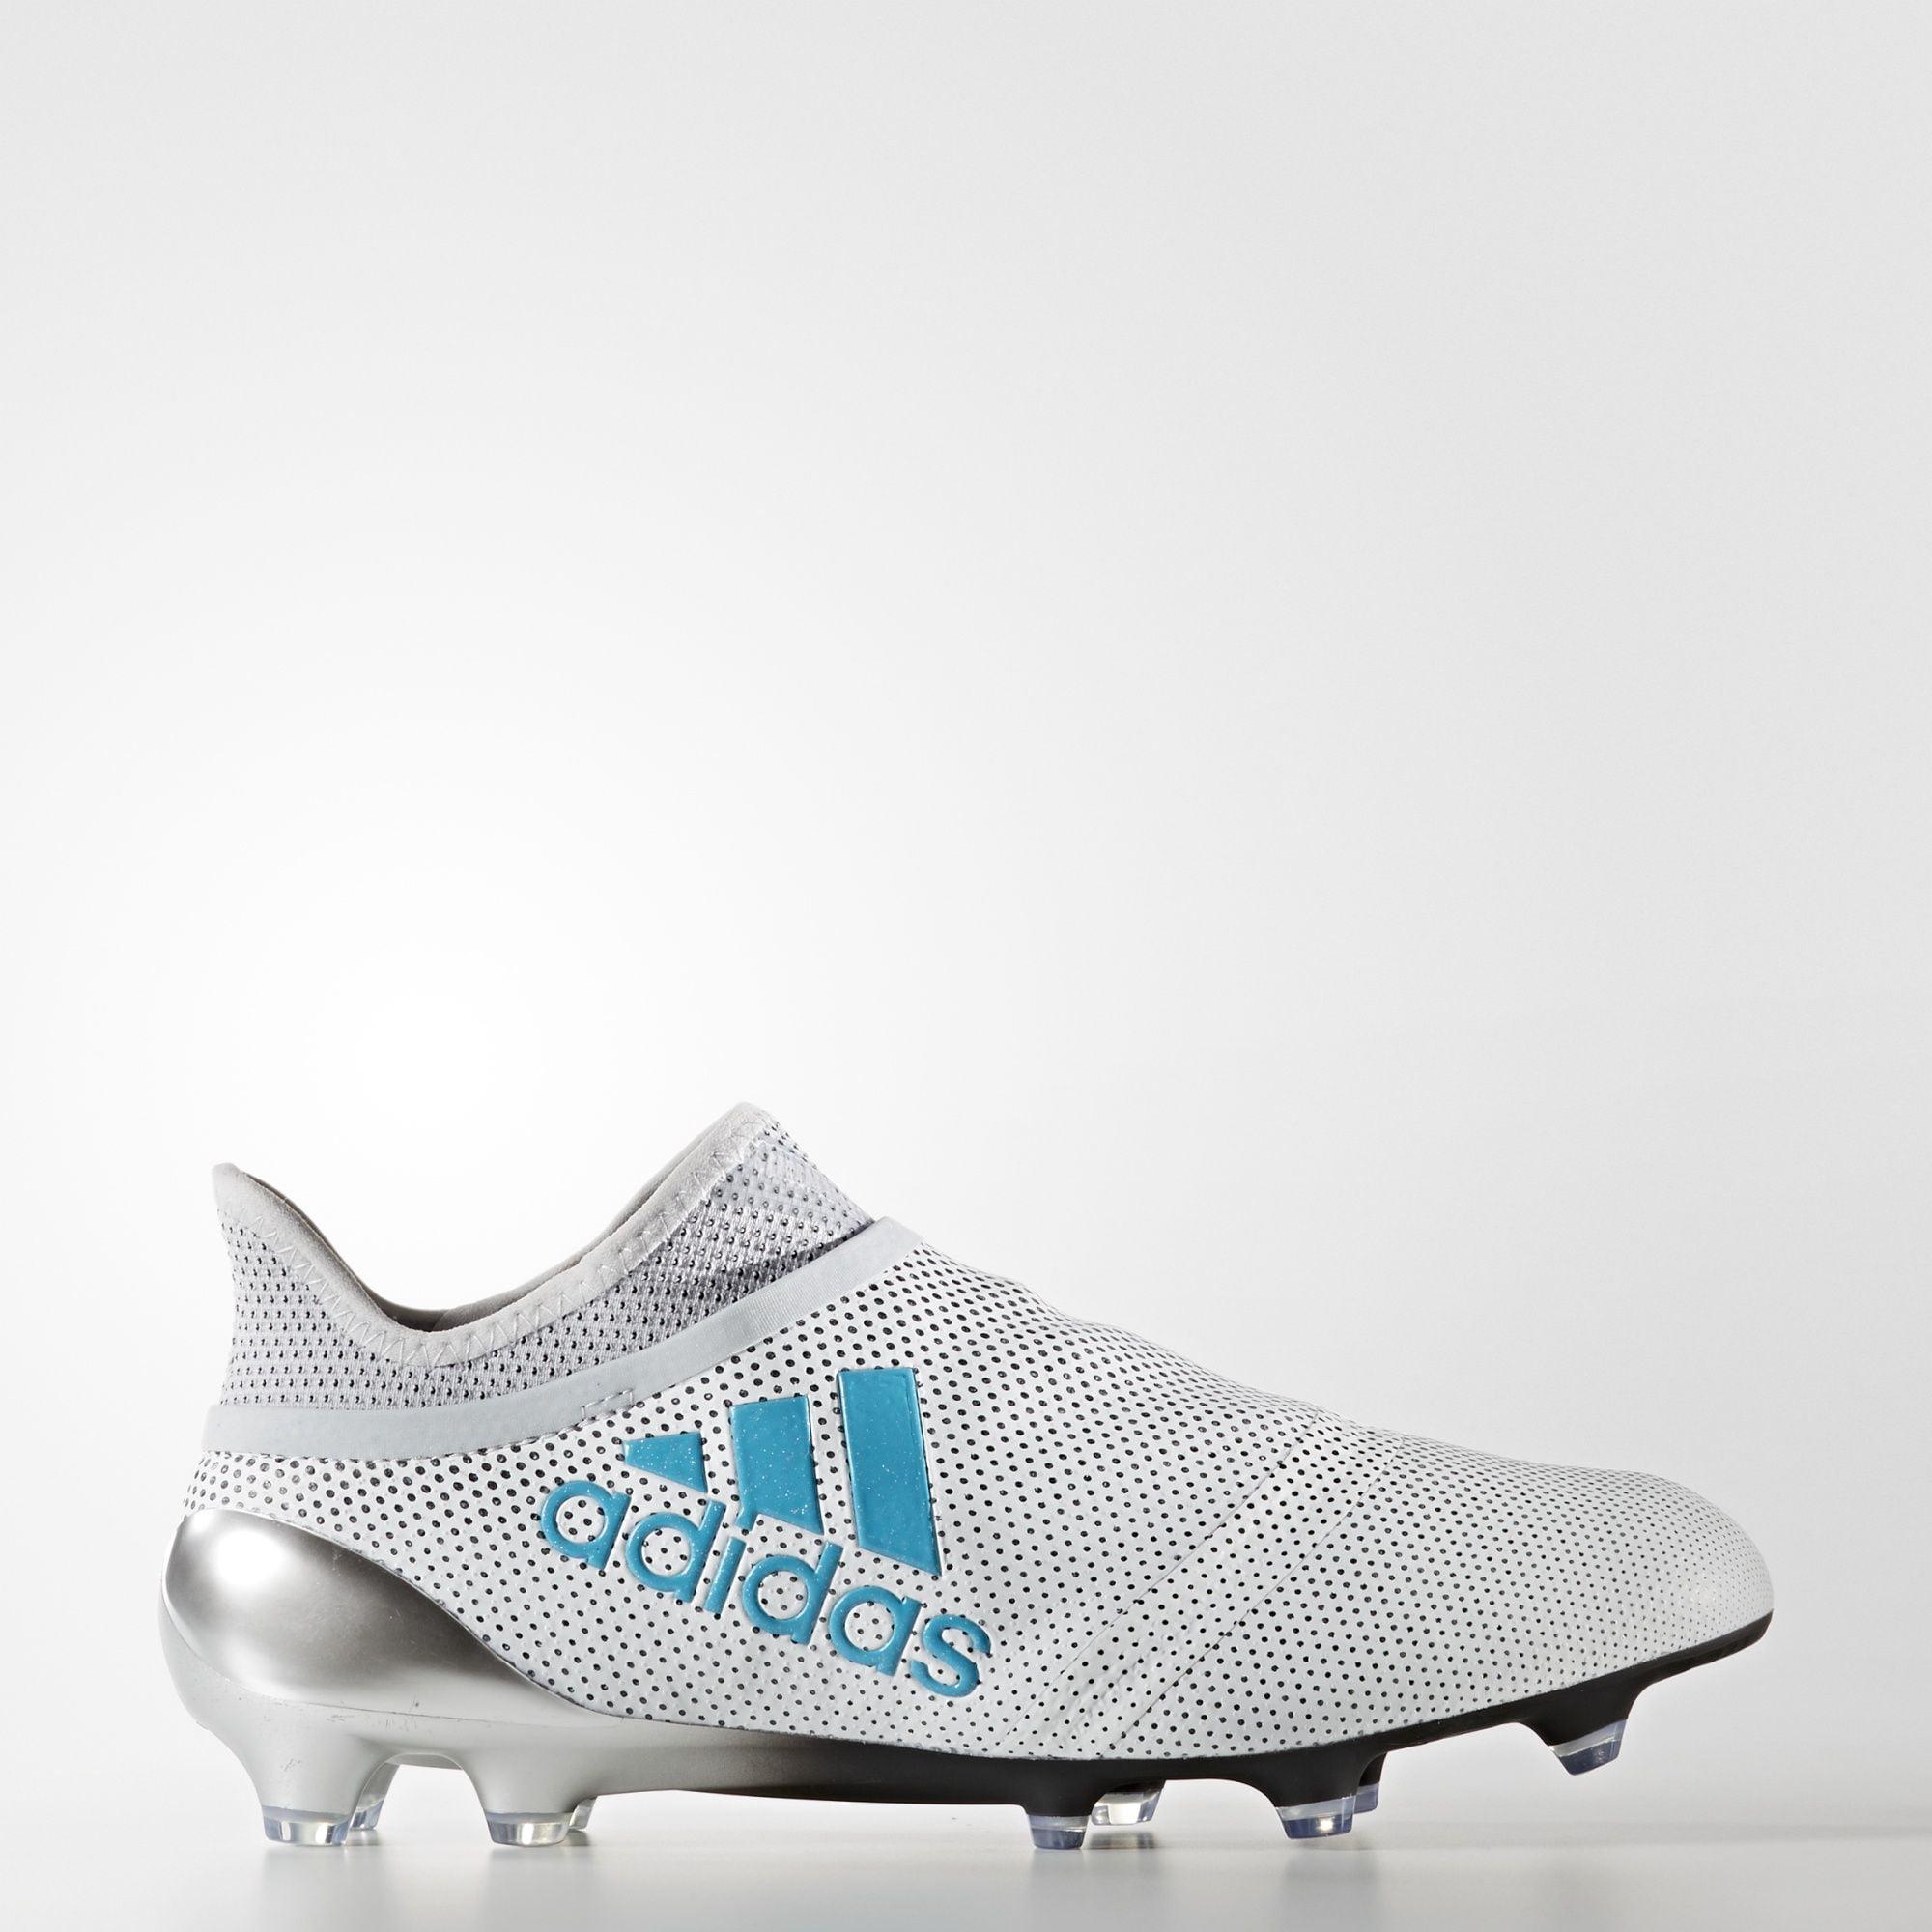 Adidas X 17+ PureChaos FG Men's Laceless Boots